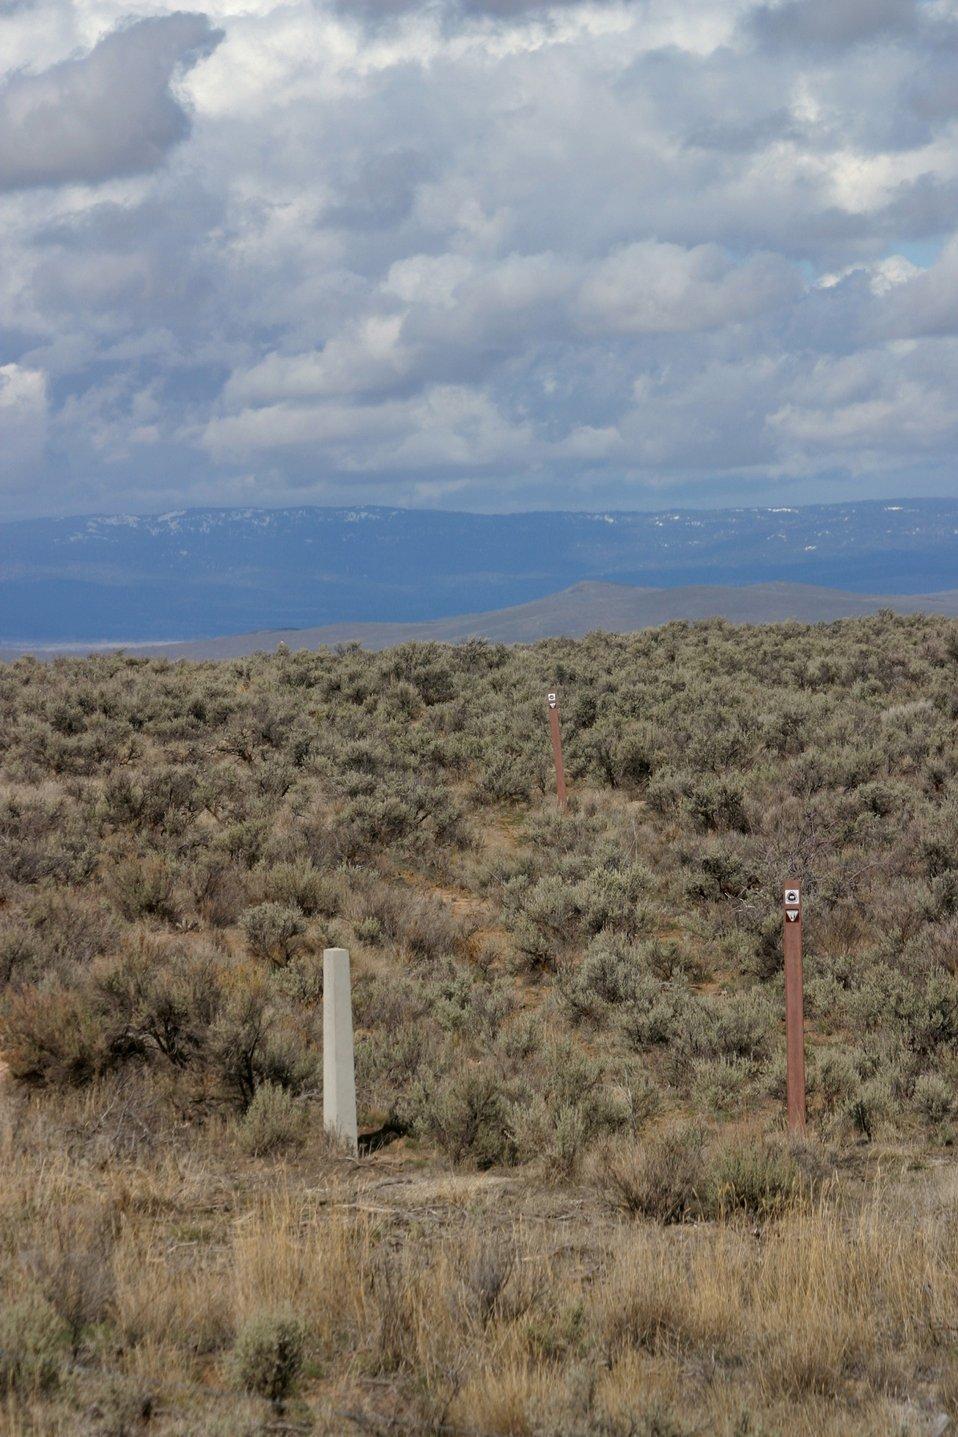 Oregon Trail ruts below the National Historic Oregon Trail Interpretive Center.